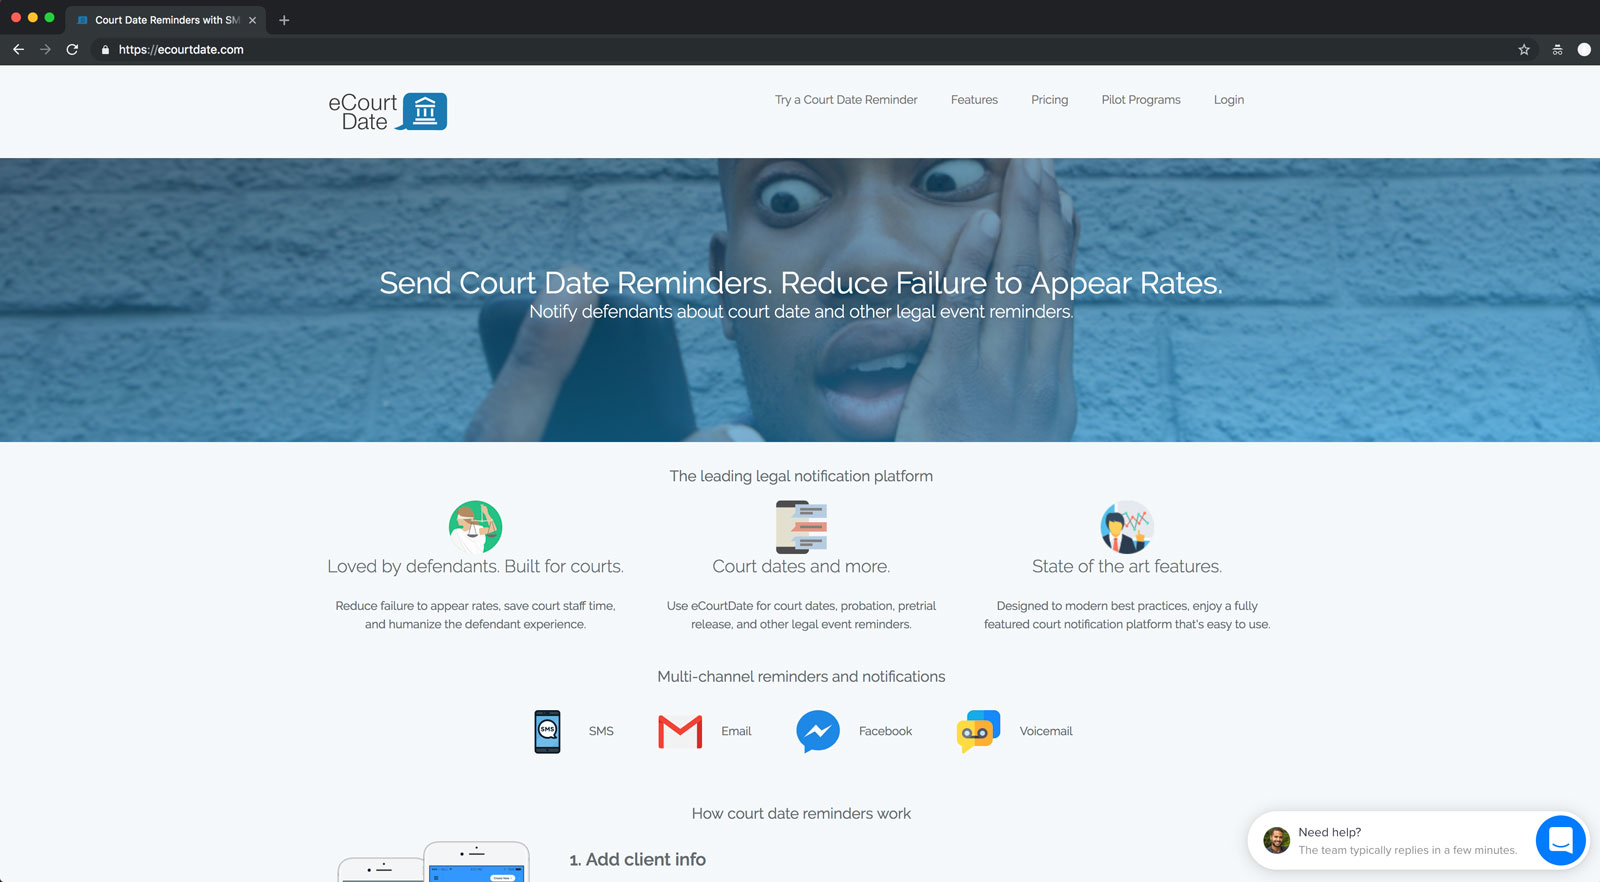 e_court_date-homepage